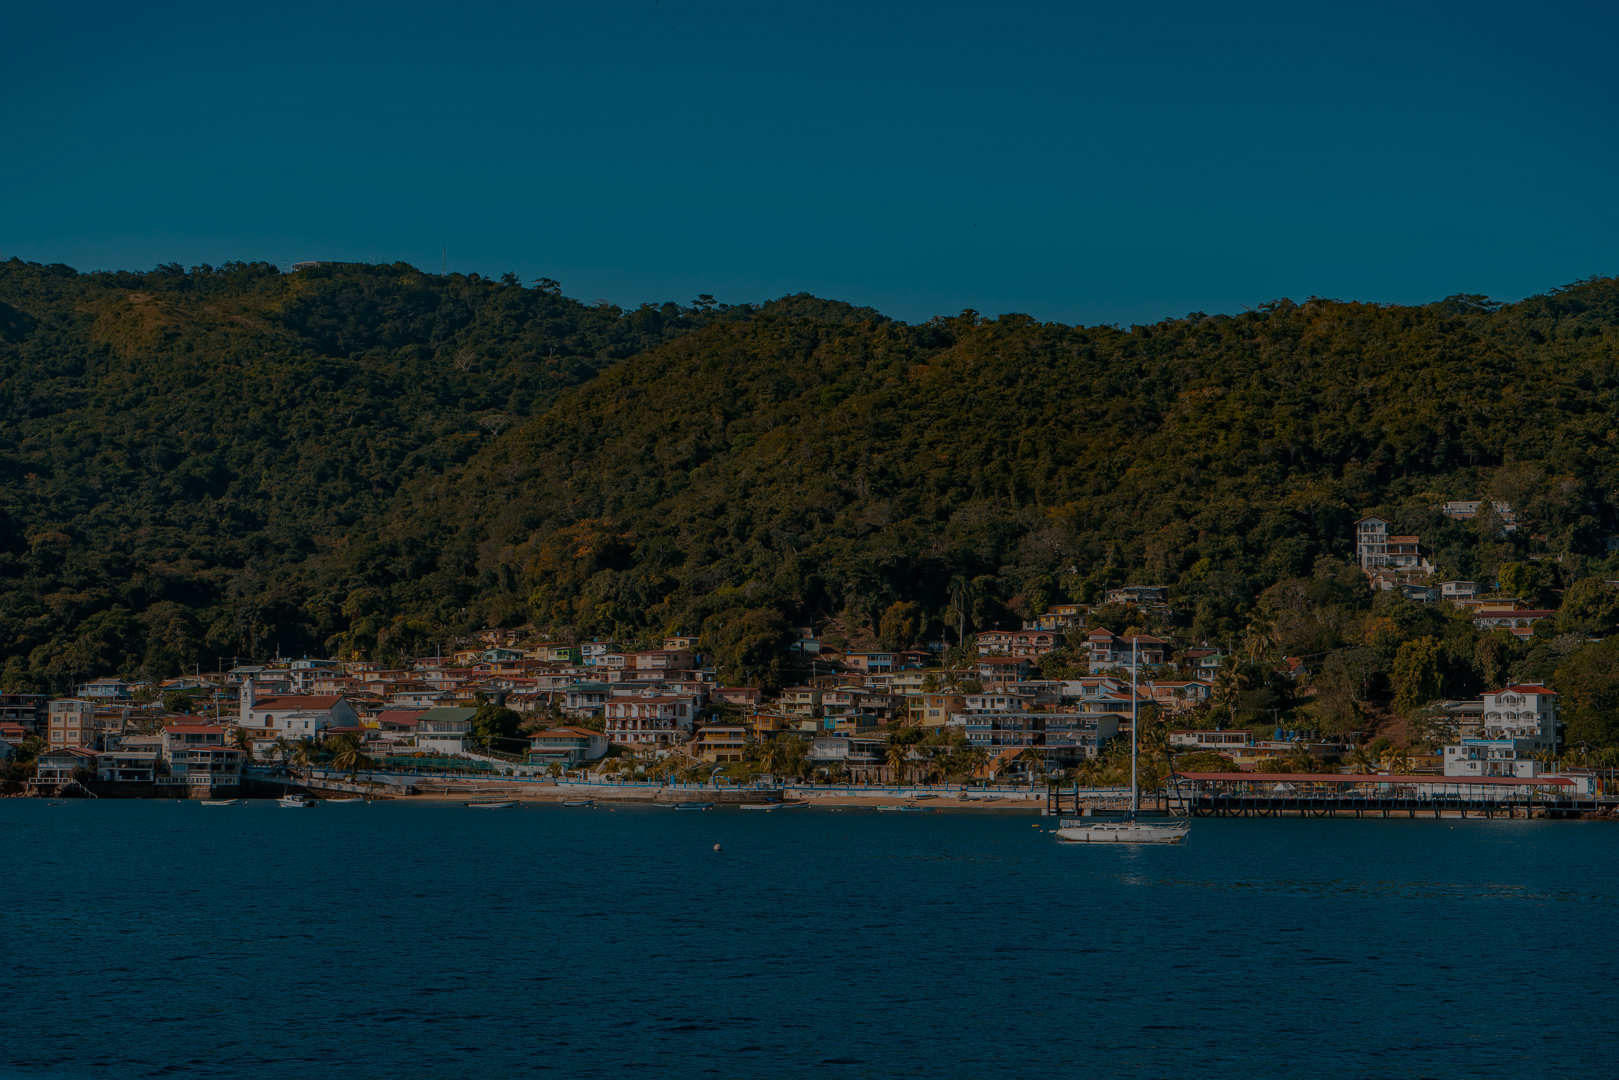 Isla de Taboga